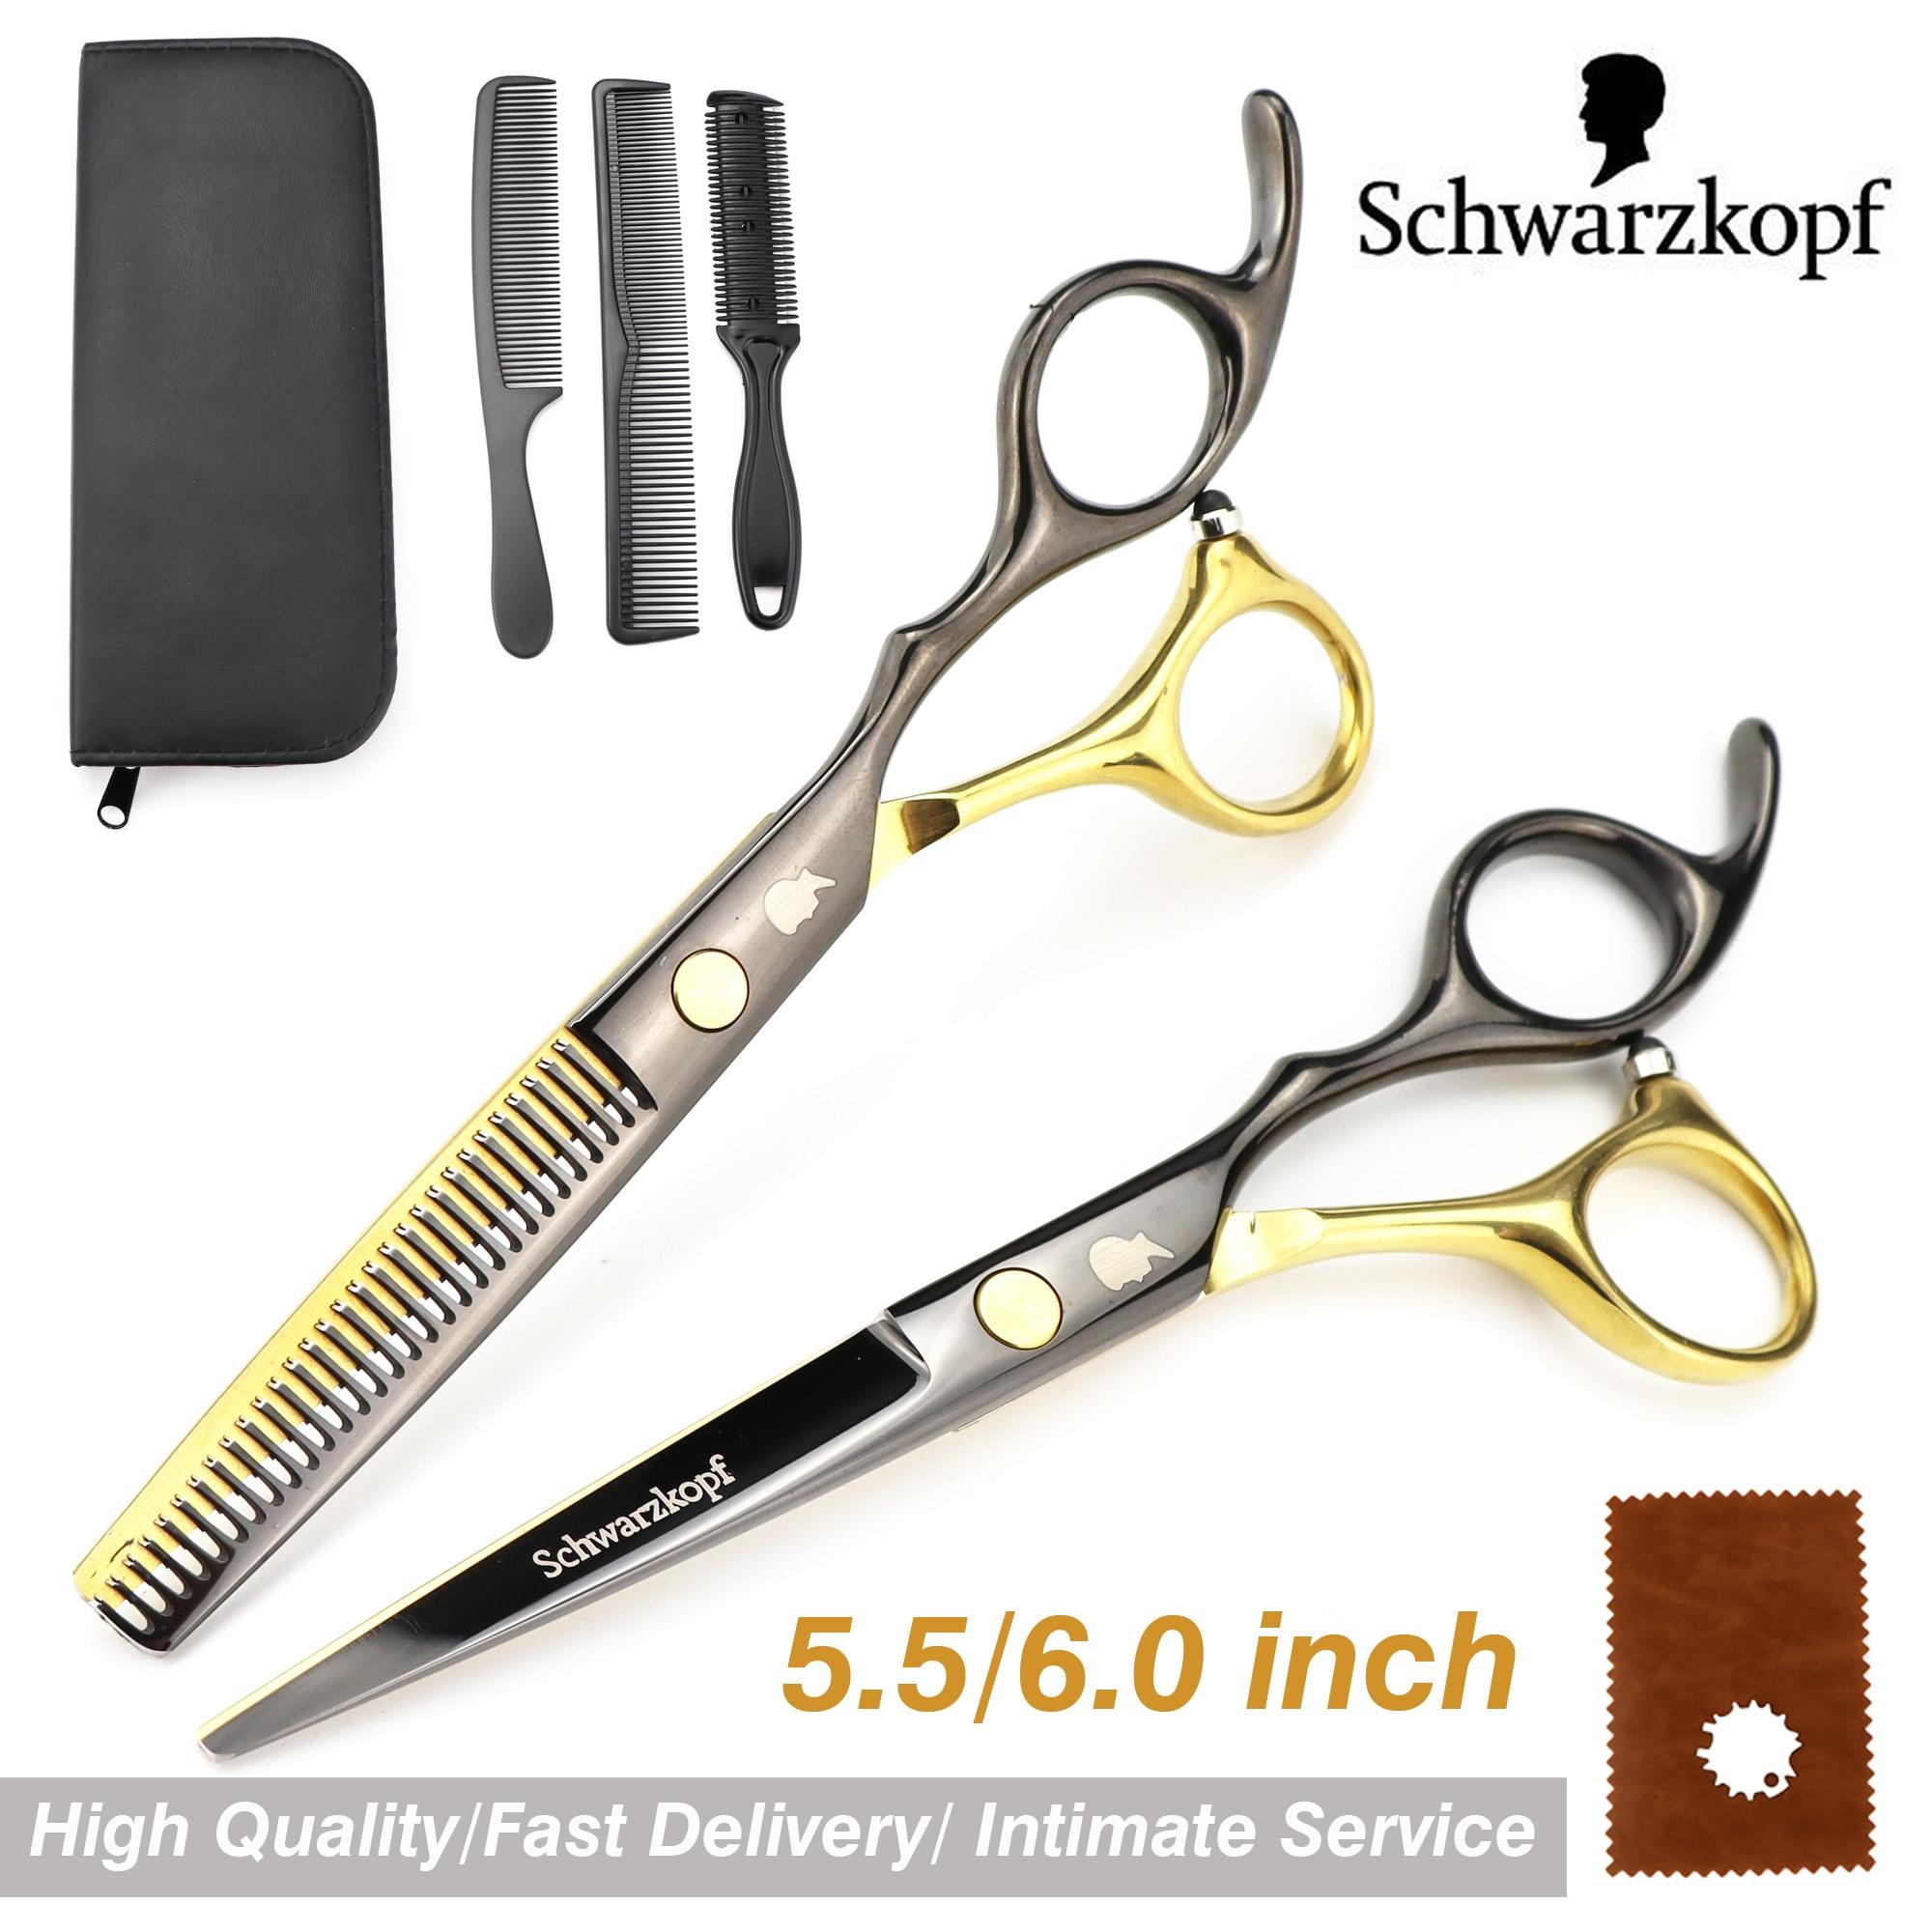 New  Profissional Hairdressing Scissors Hair Cutting Scissors Set Barber Shears  High Quality Salon 6.0inch Multi-color optiona